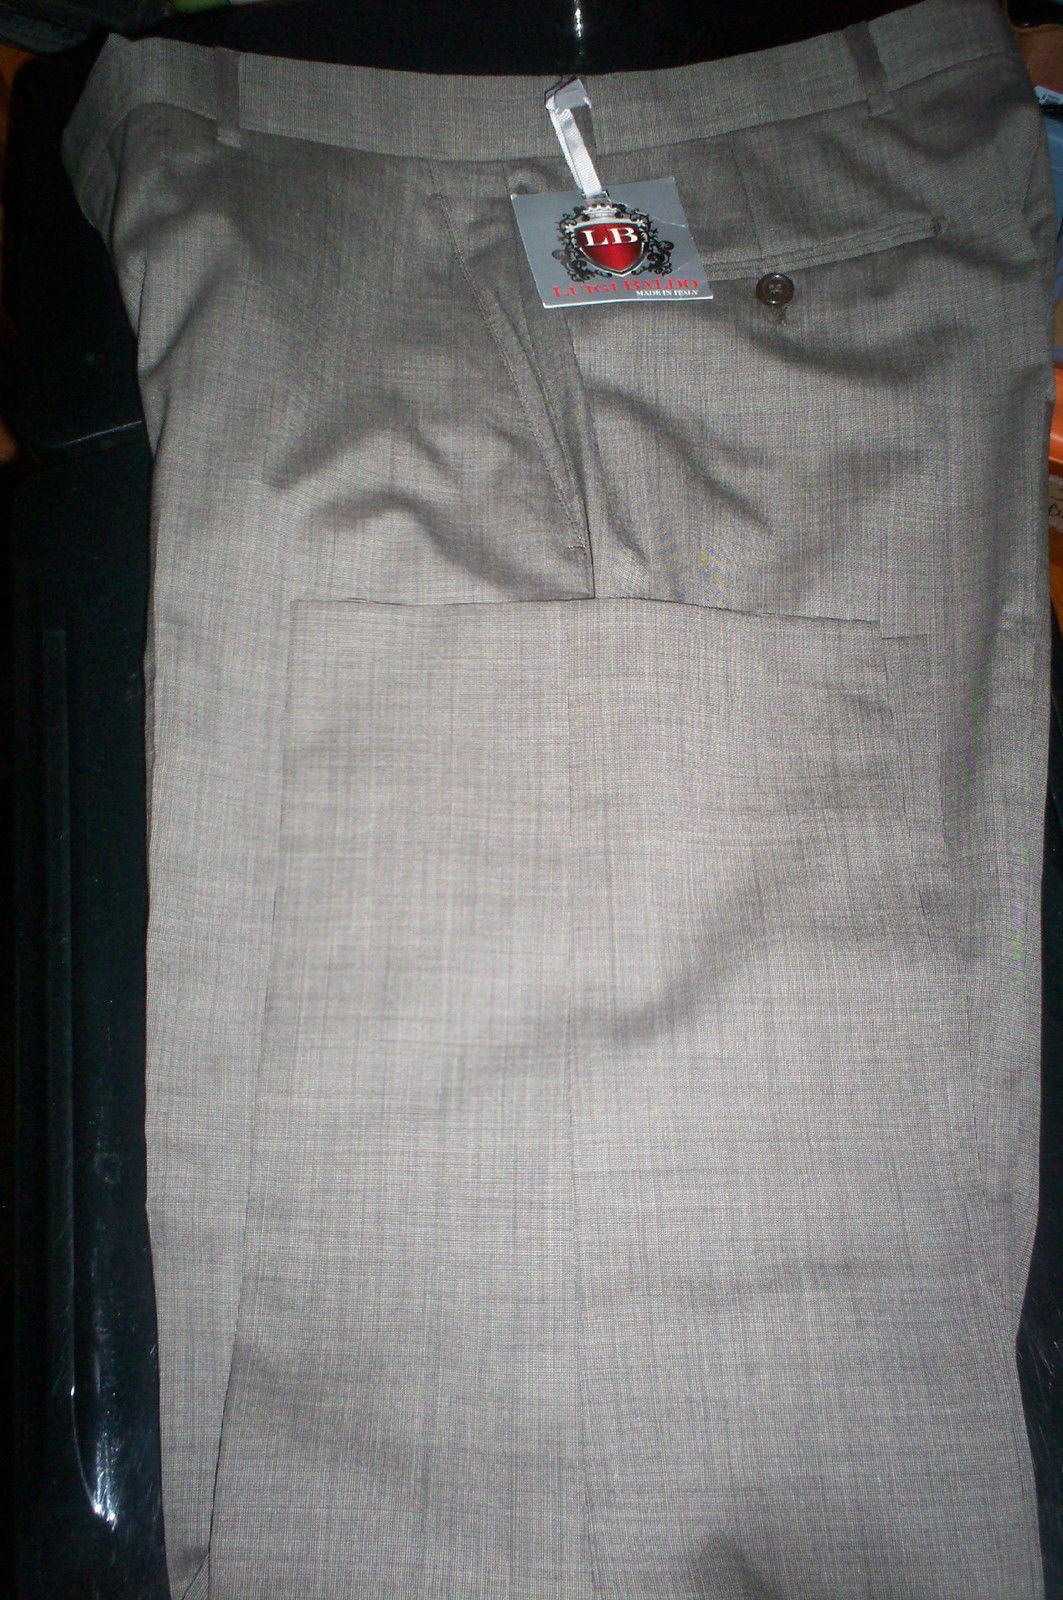 NWT  Luigi Baldo TOLLEGNO 1900 SUPER 130'S 100% Wool Dress Pants-BROWN- 38X29